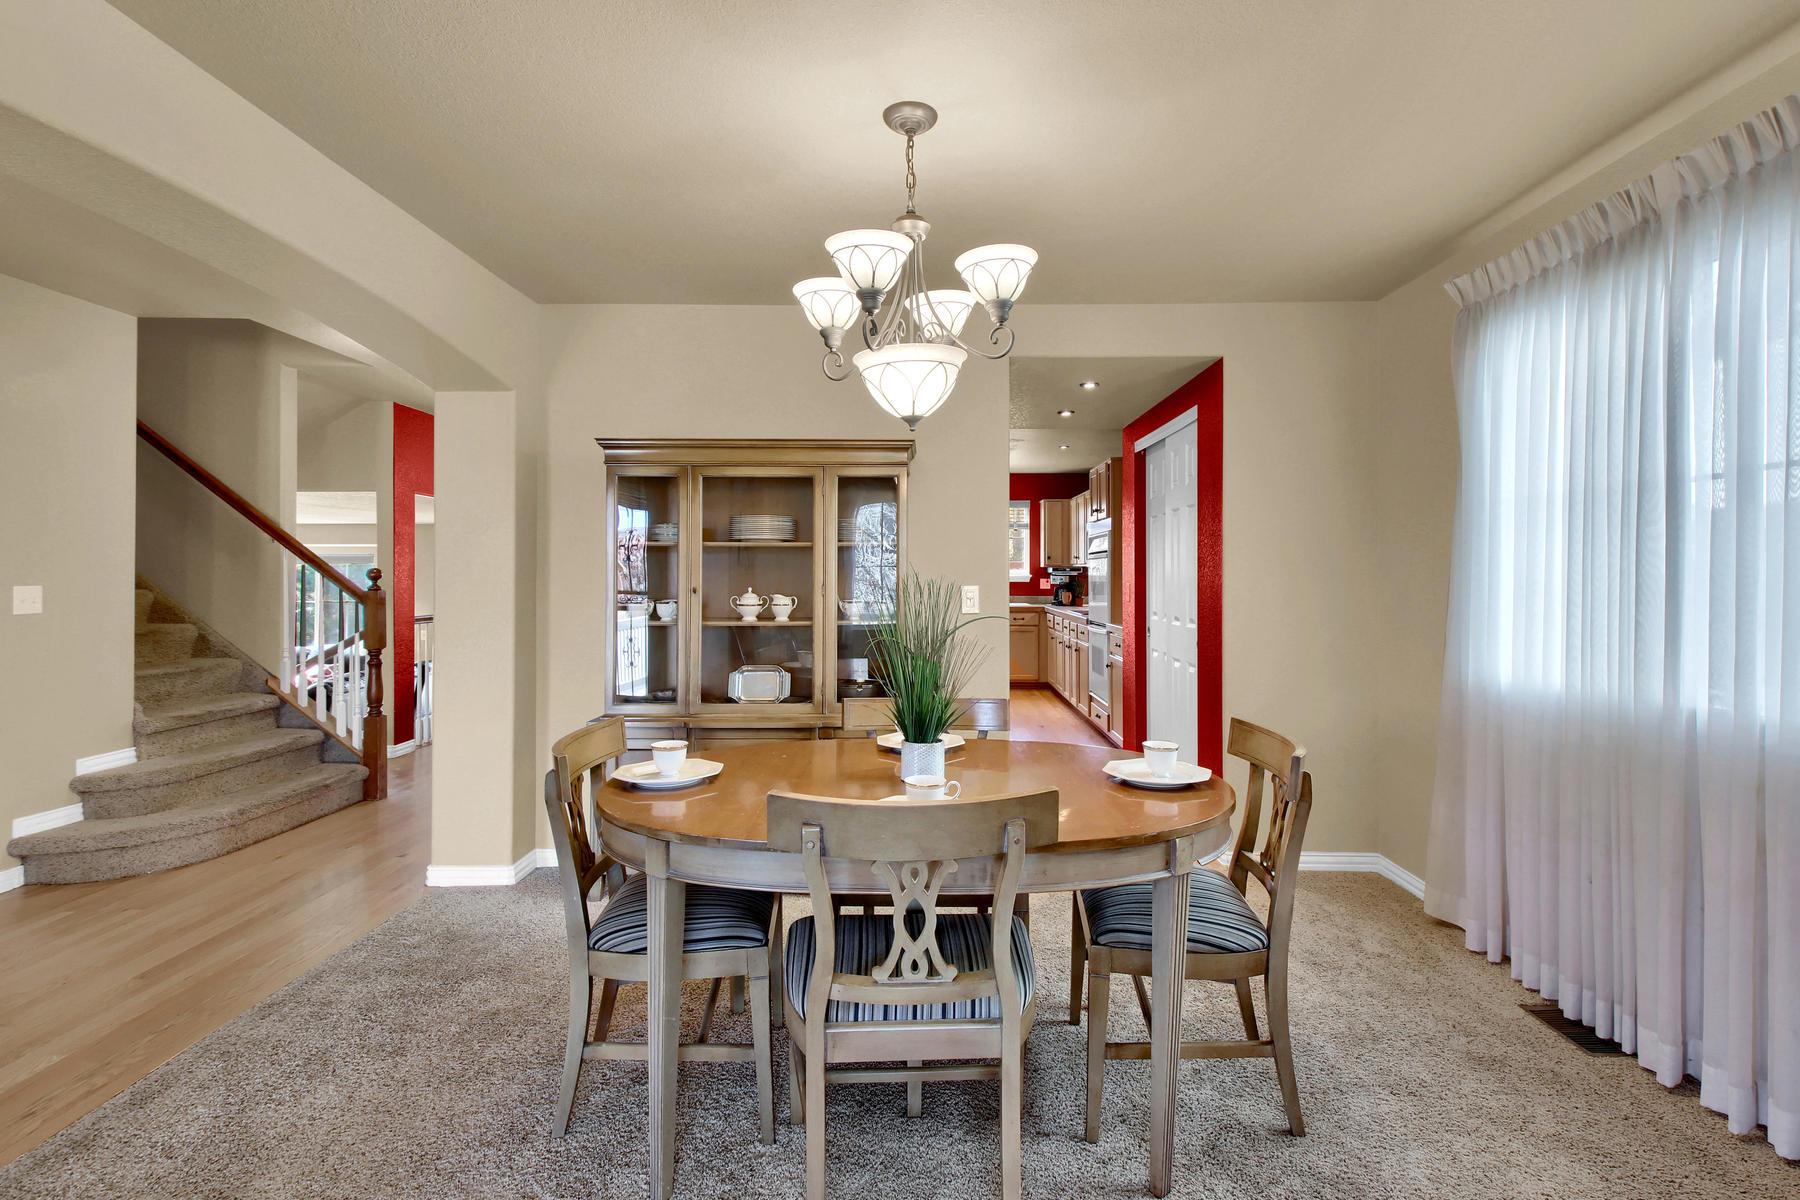 5367 Parfet St Arvada CO 80002-009-5-Dining Room-MLS_Size.jpg